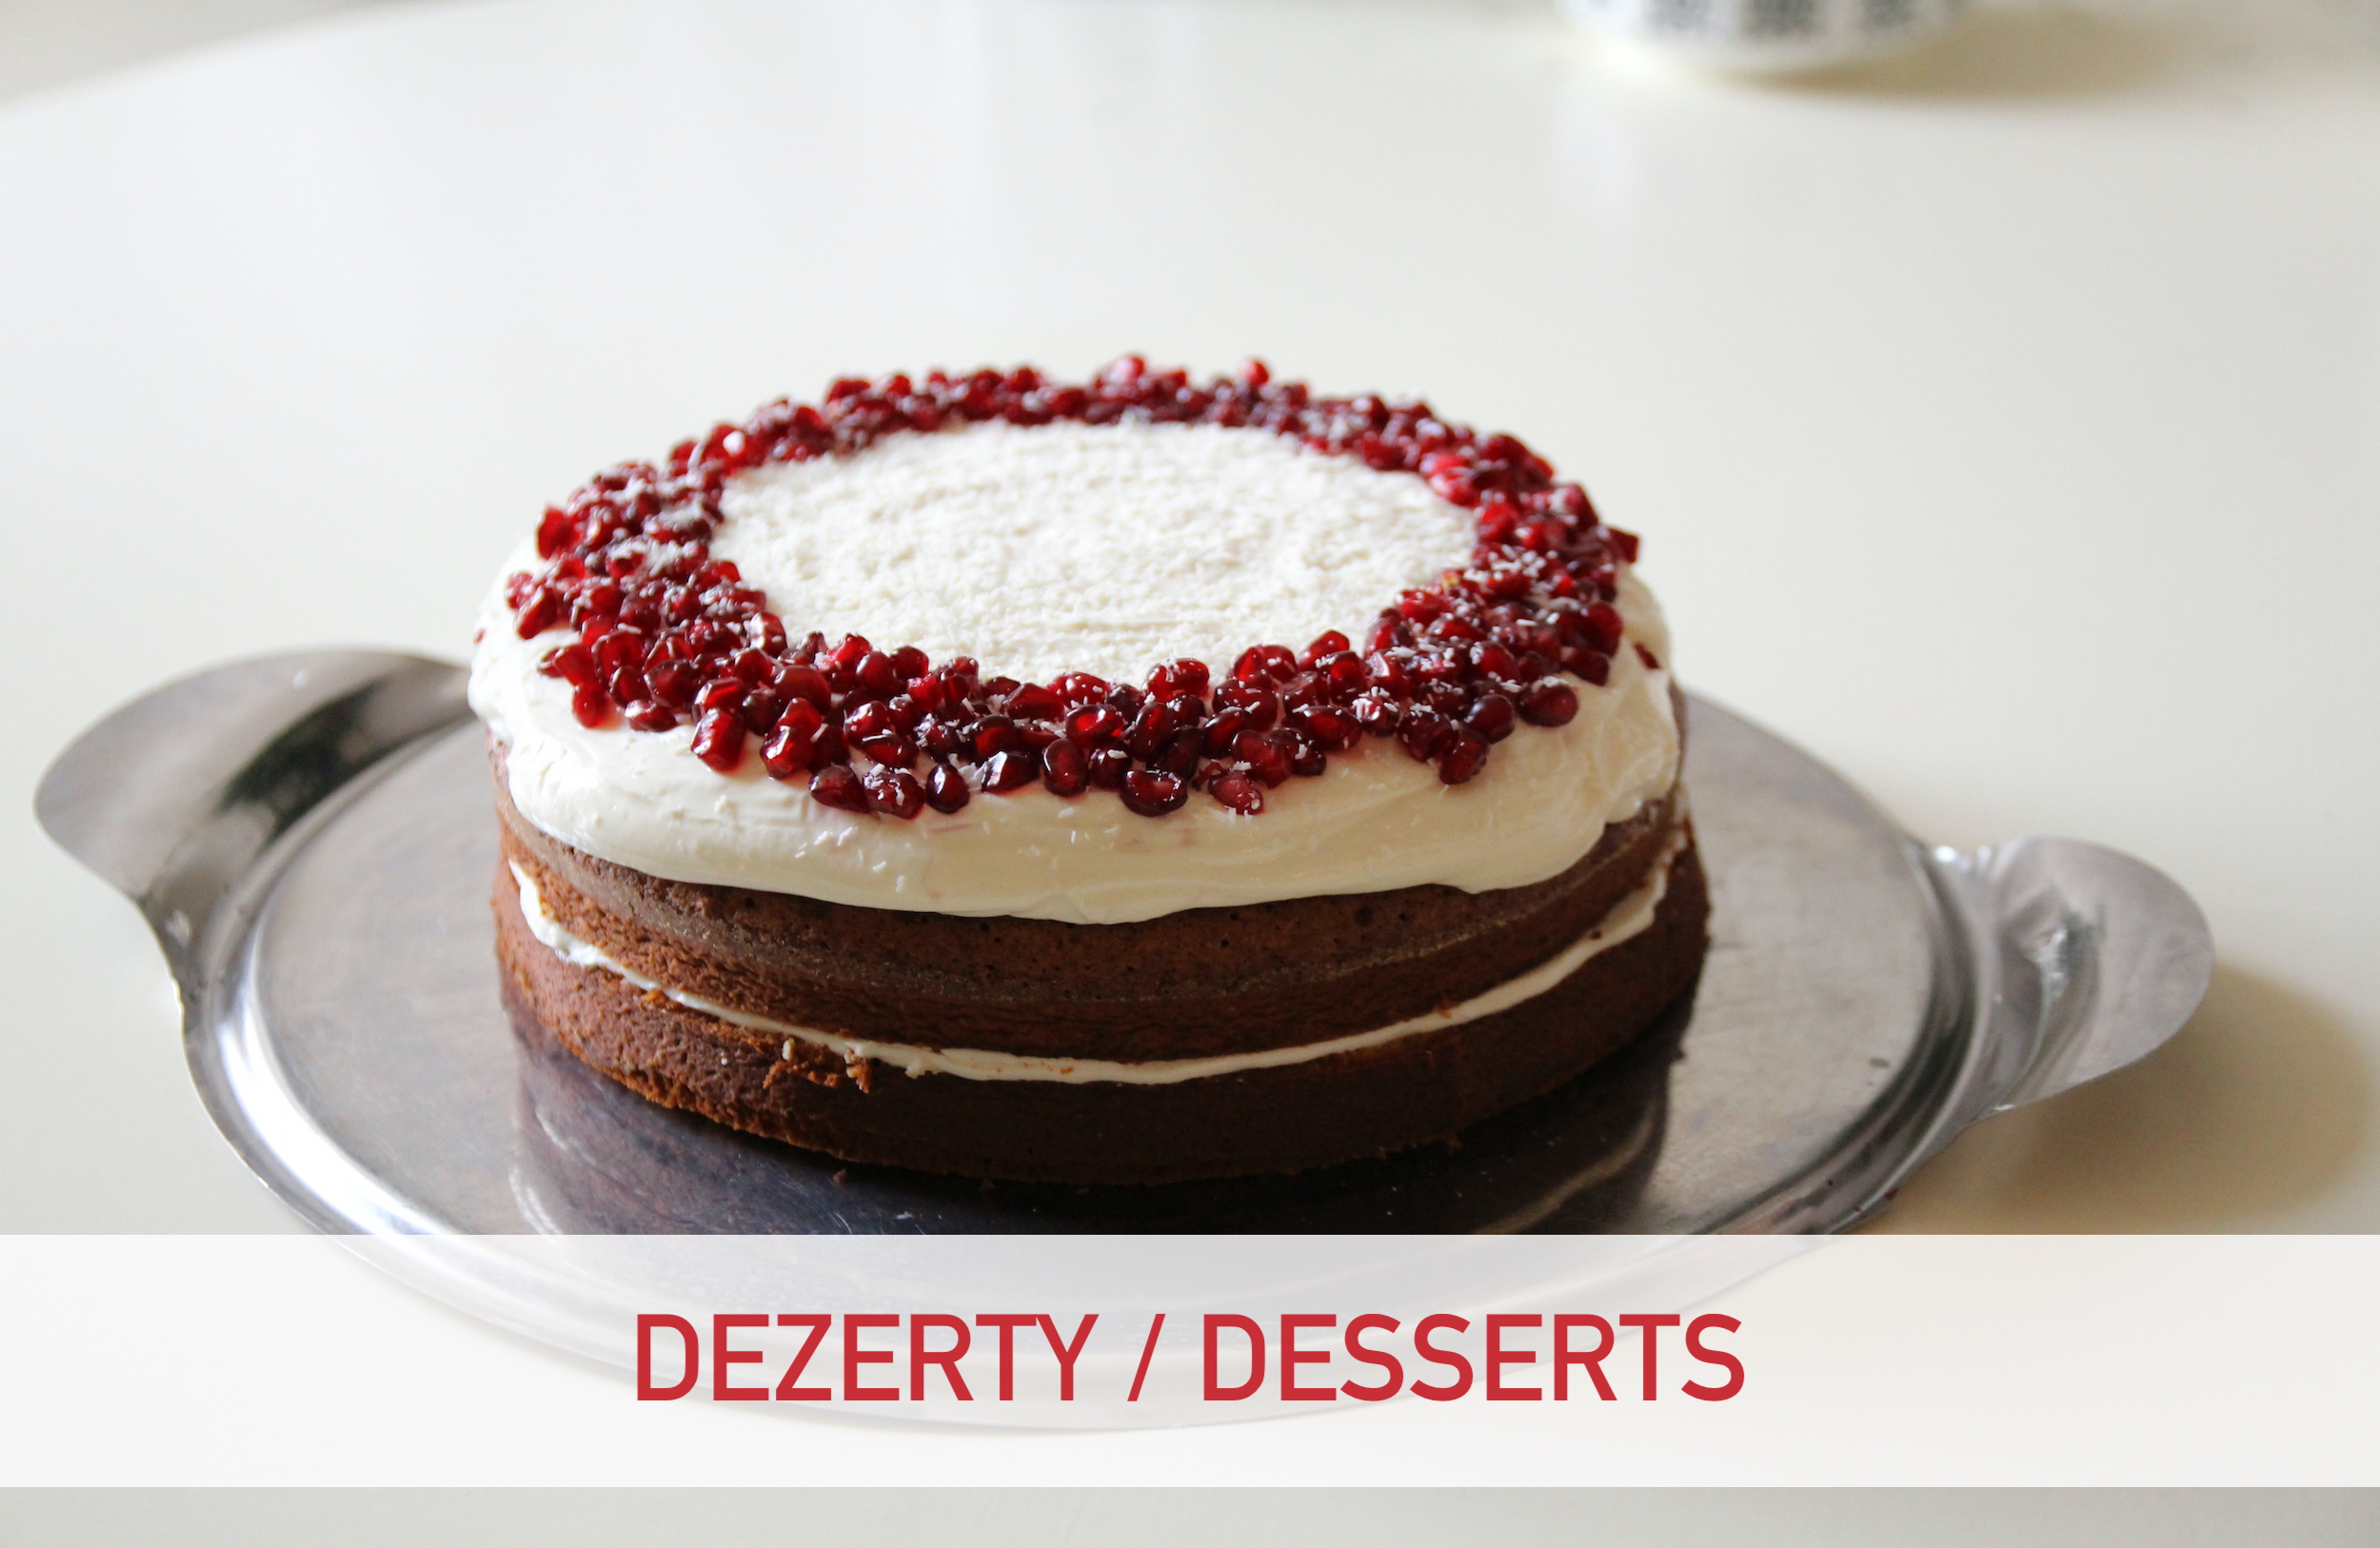 DEZERTY / DESSERTS 8:30 - 14:30